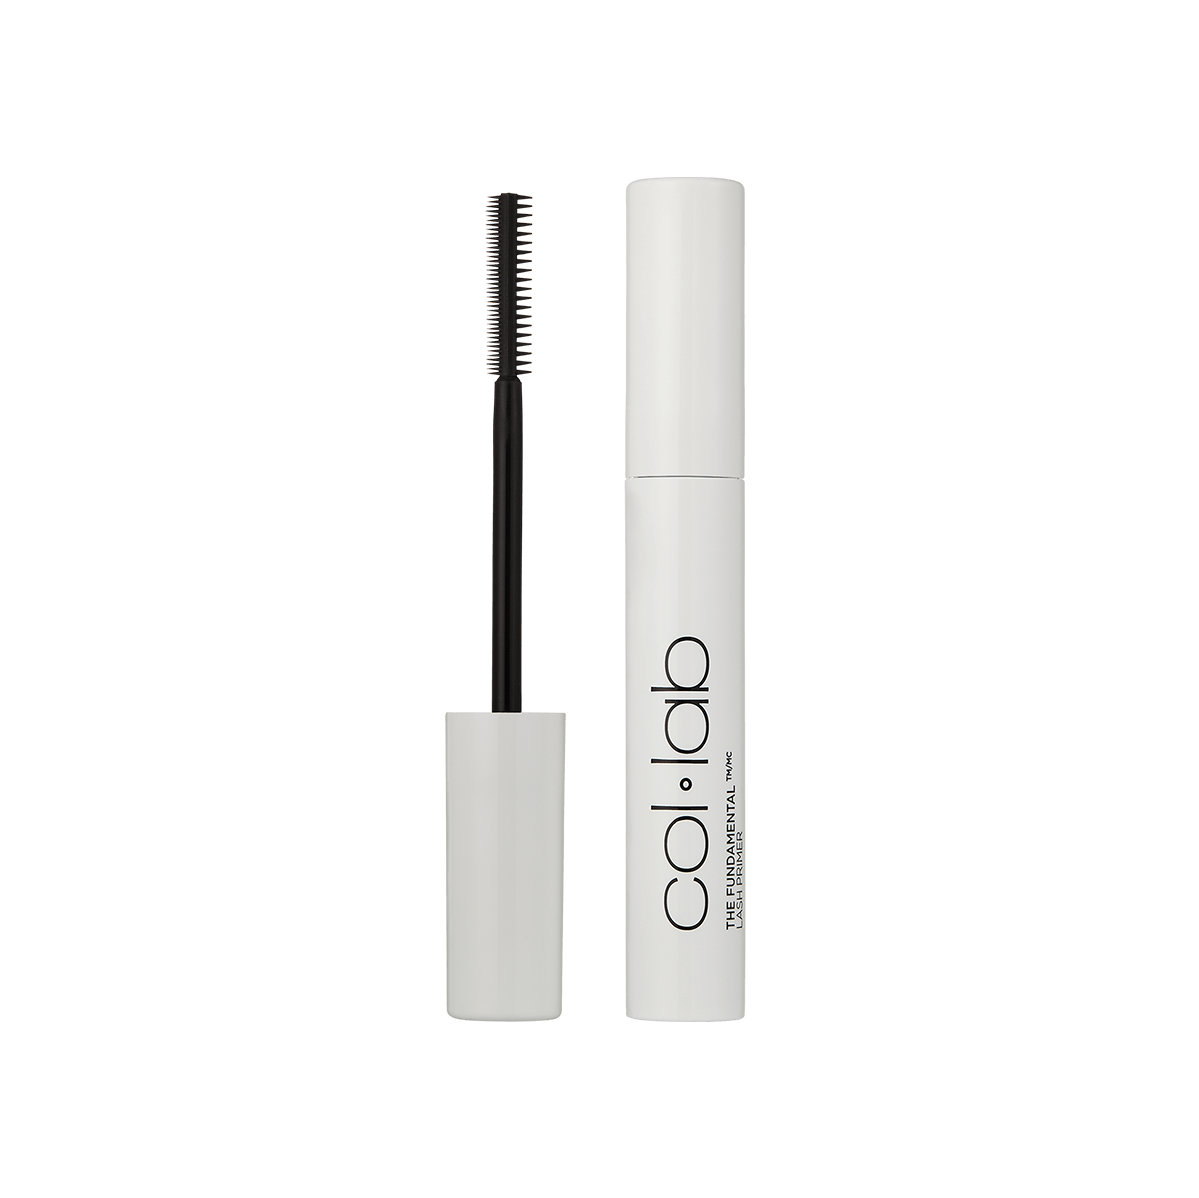 collab-the-fundamental-lash-primer.png